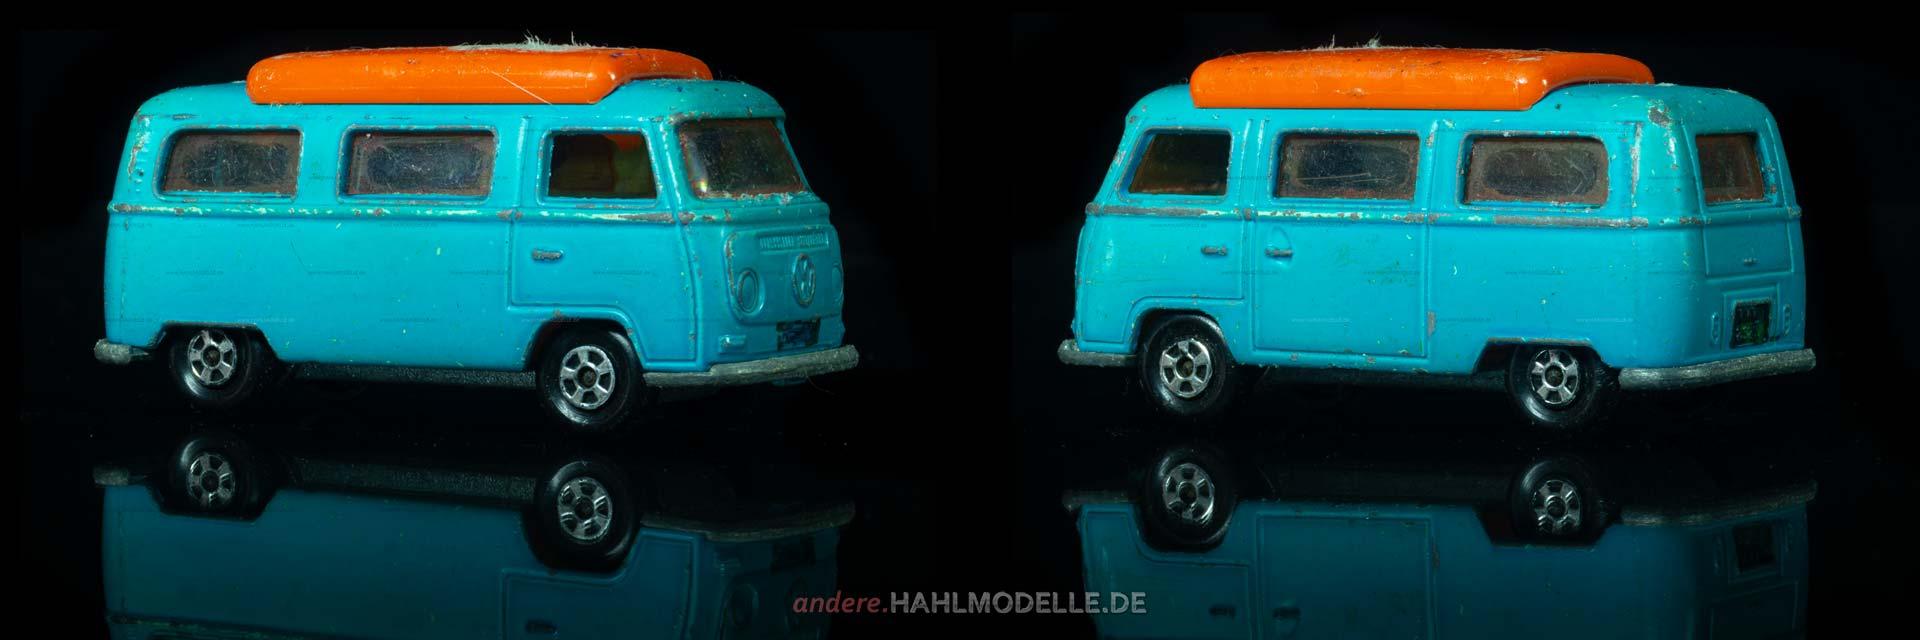 "Volkswagen Bulli (Typ 2 T2a) | Bus | Lesney Products & Co. Ltd. | 1:51 | Matchbox Superfast ""Volkswagen Camper"" | www.andere.hahlmodelle.de"